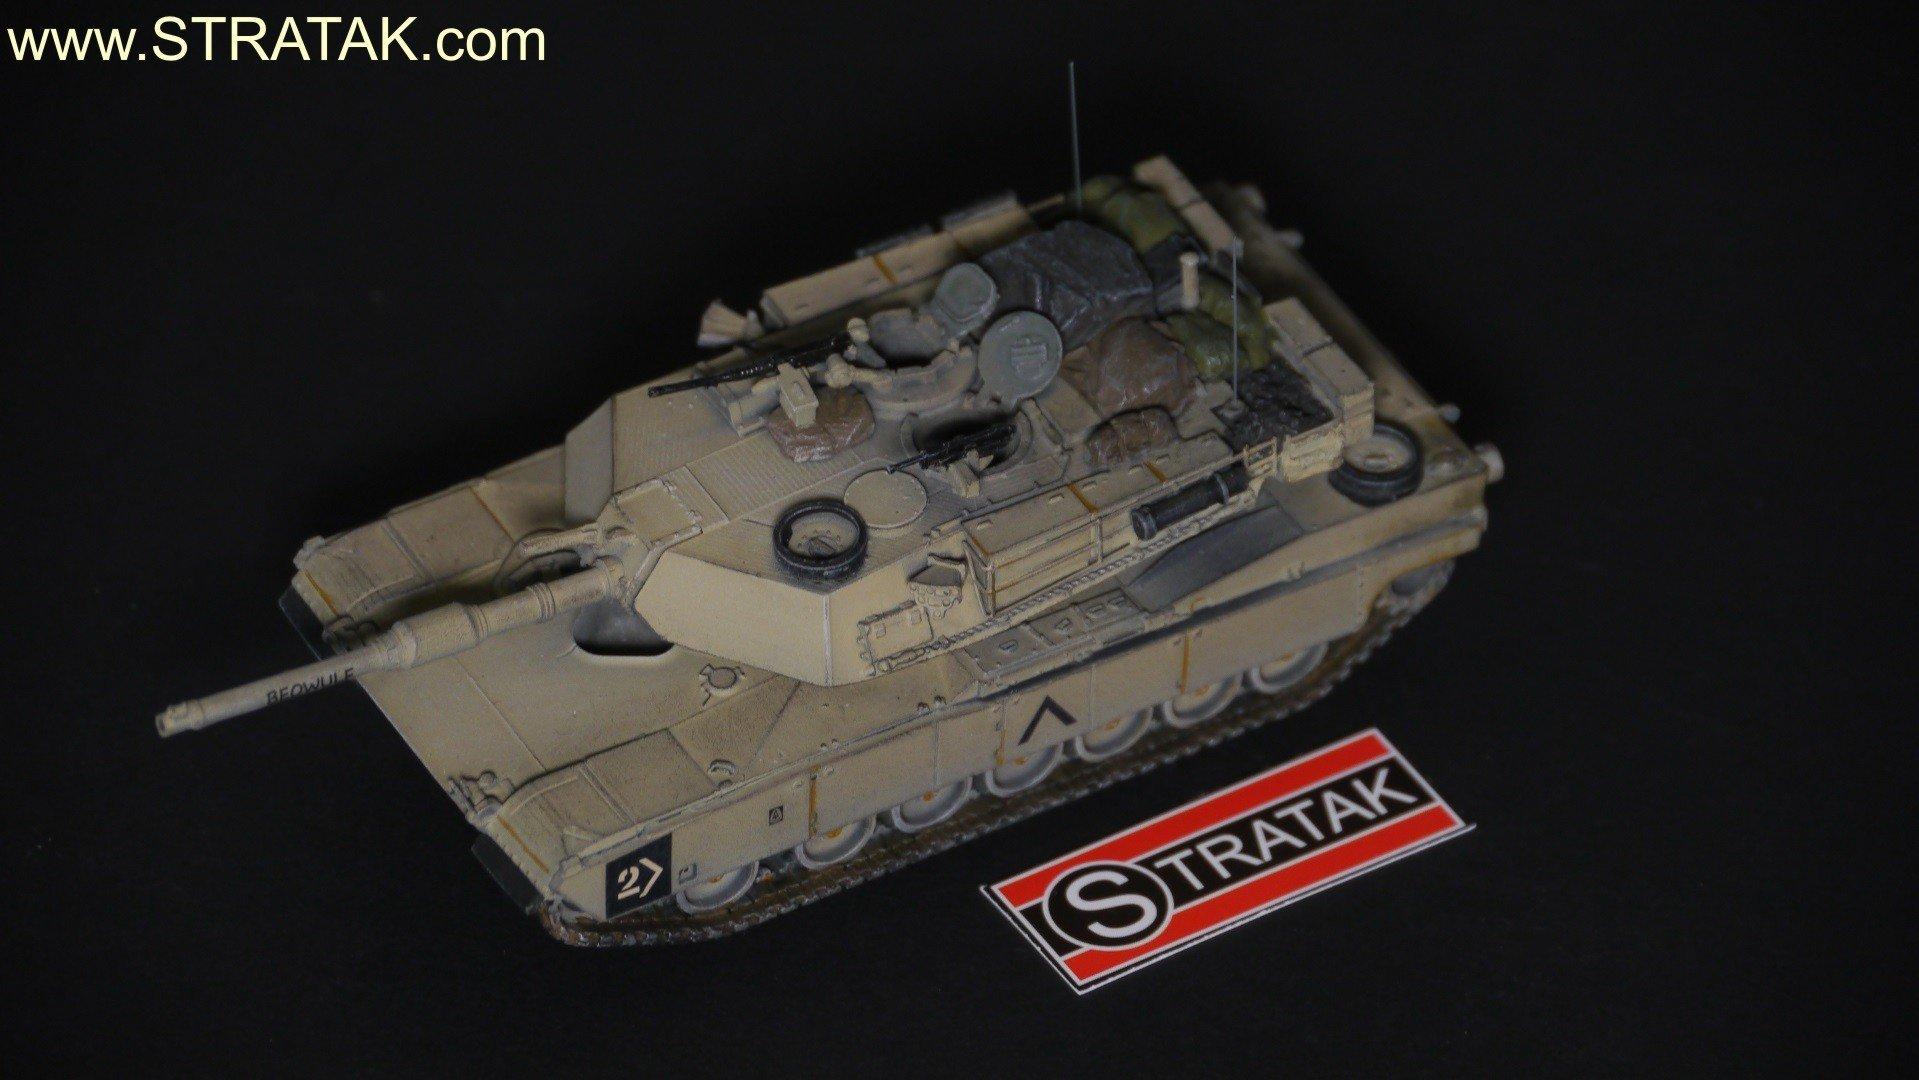 artitec 6870142 us tank m1 abrams desert storm beowulfartitec 6870142 us m1 abrams desert storm beowulf